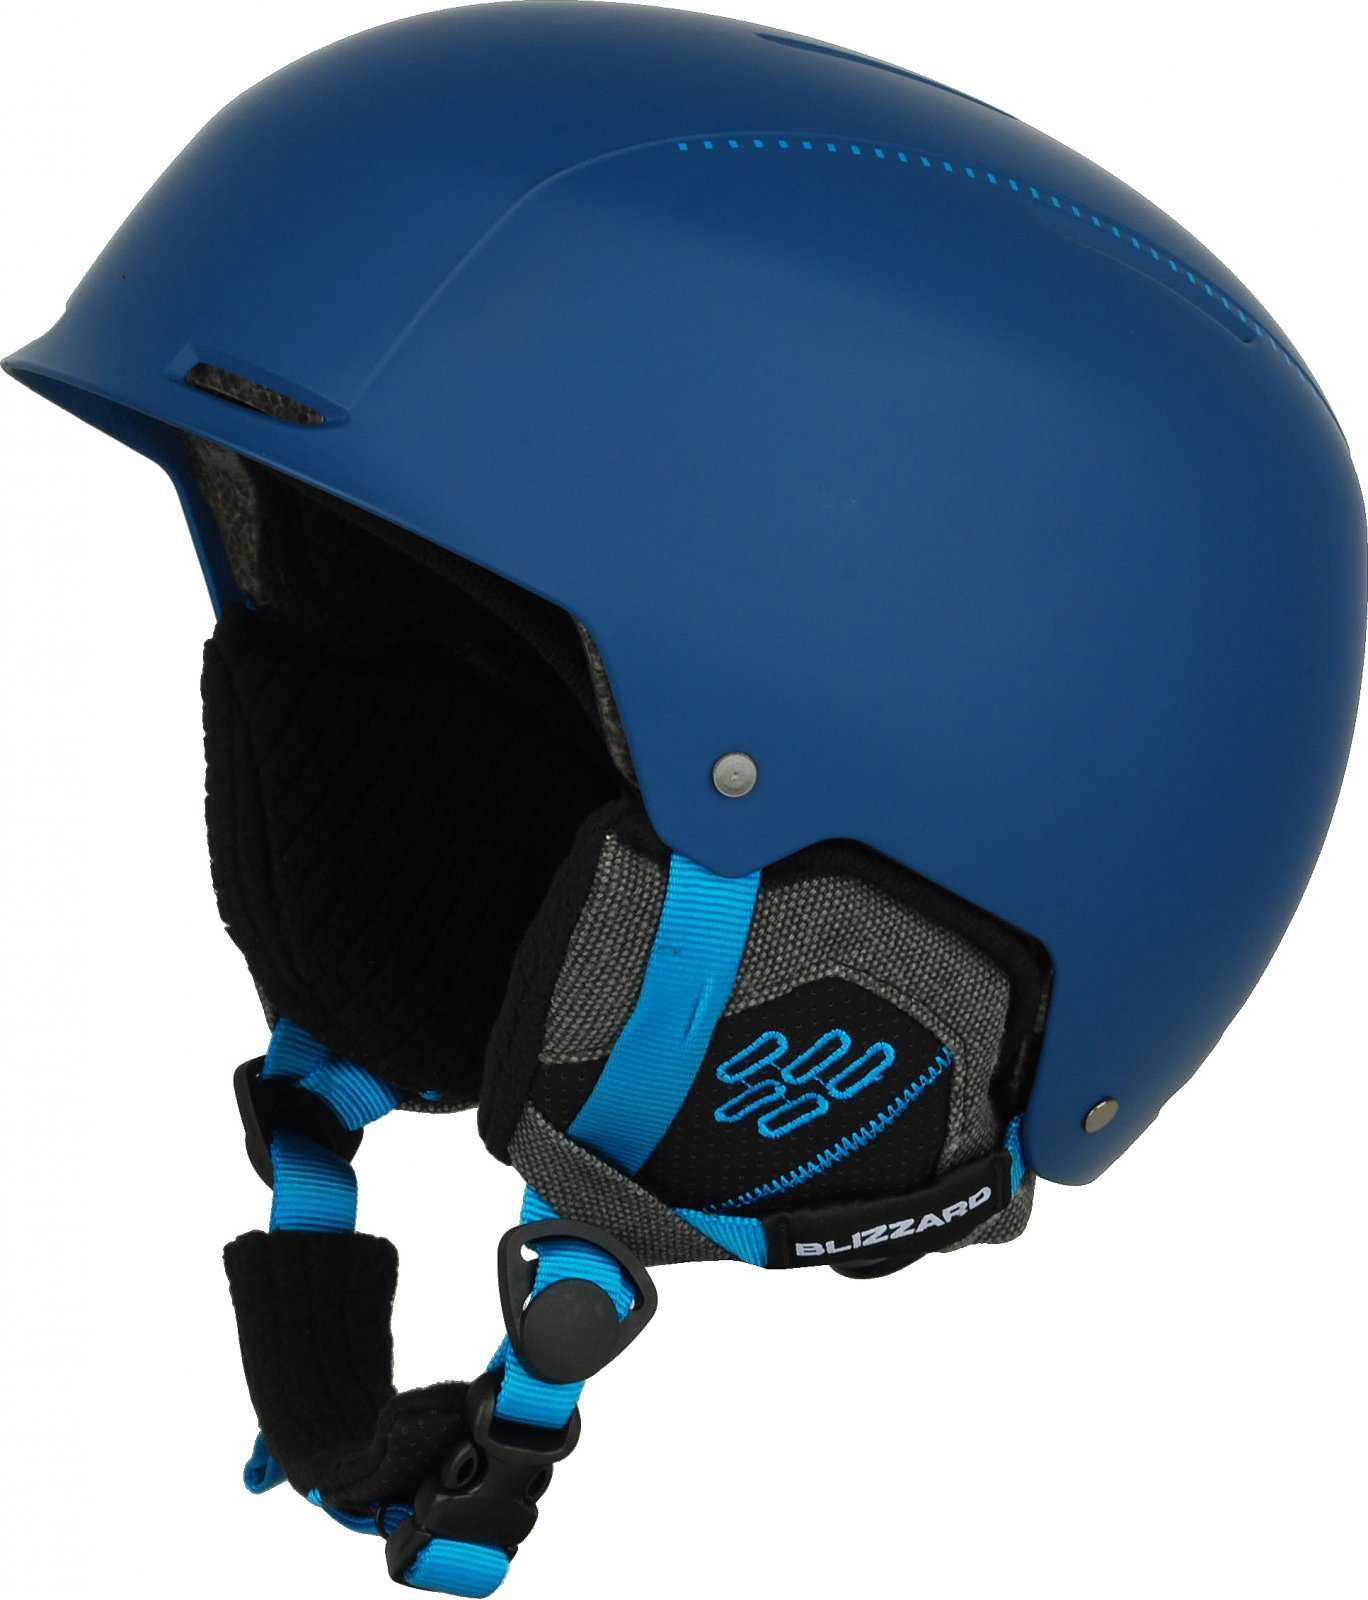 Blizzard Guide Ski Helmet Deep Blue Matt Bright Blue Matt od 782 Kč •  Zboží.cz 044252883b6